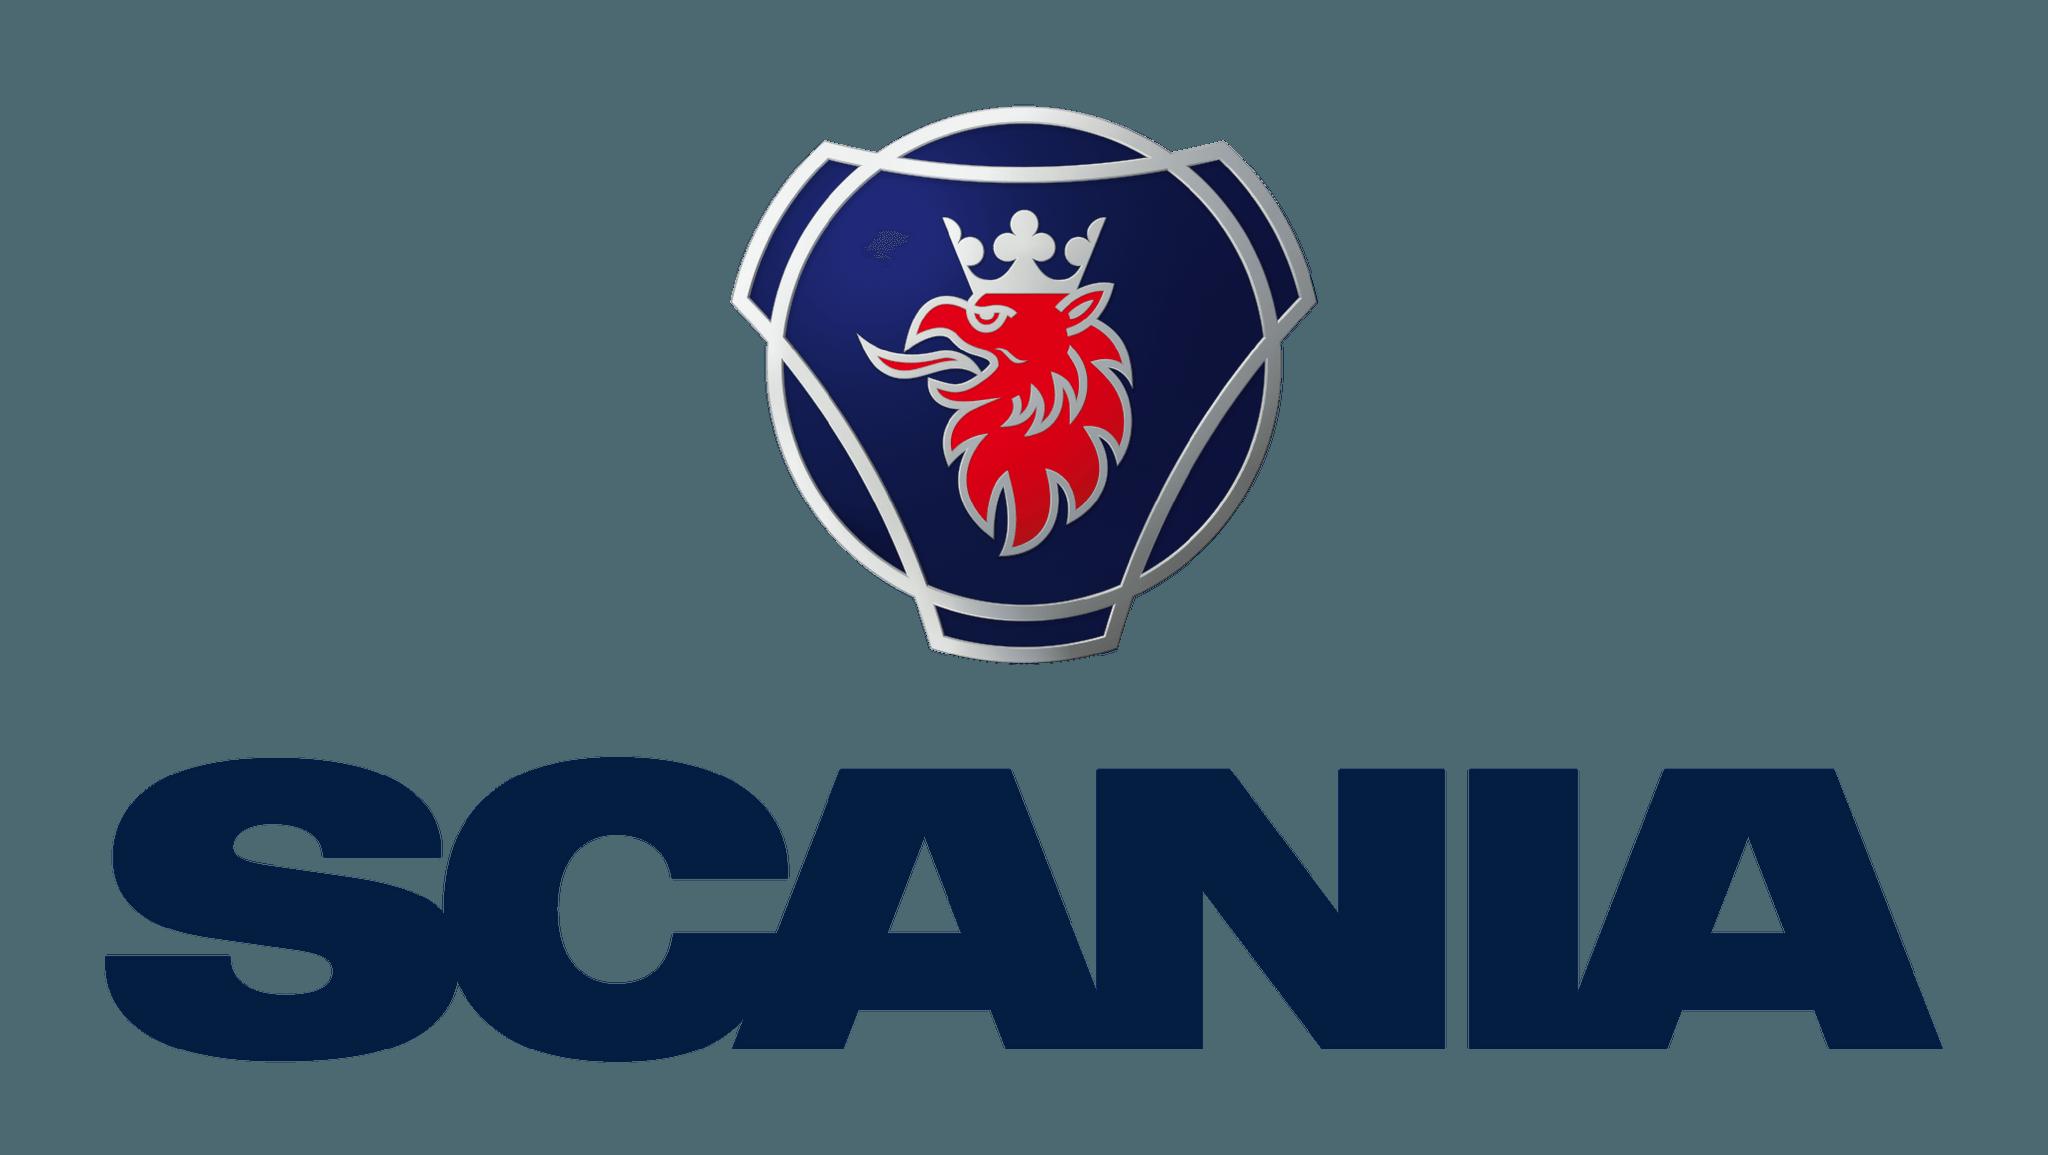 Scania (Great Britain) Ltd